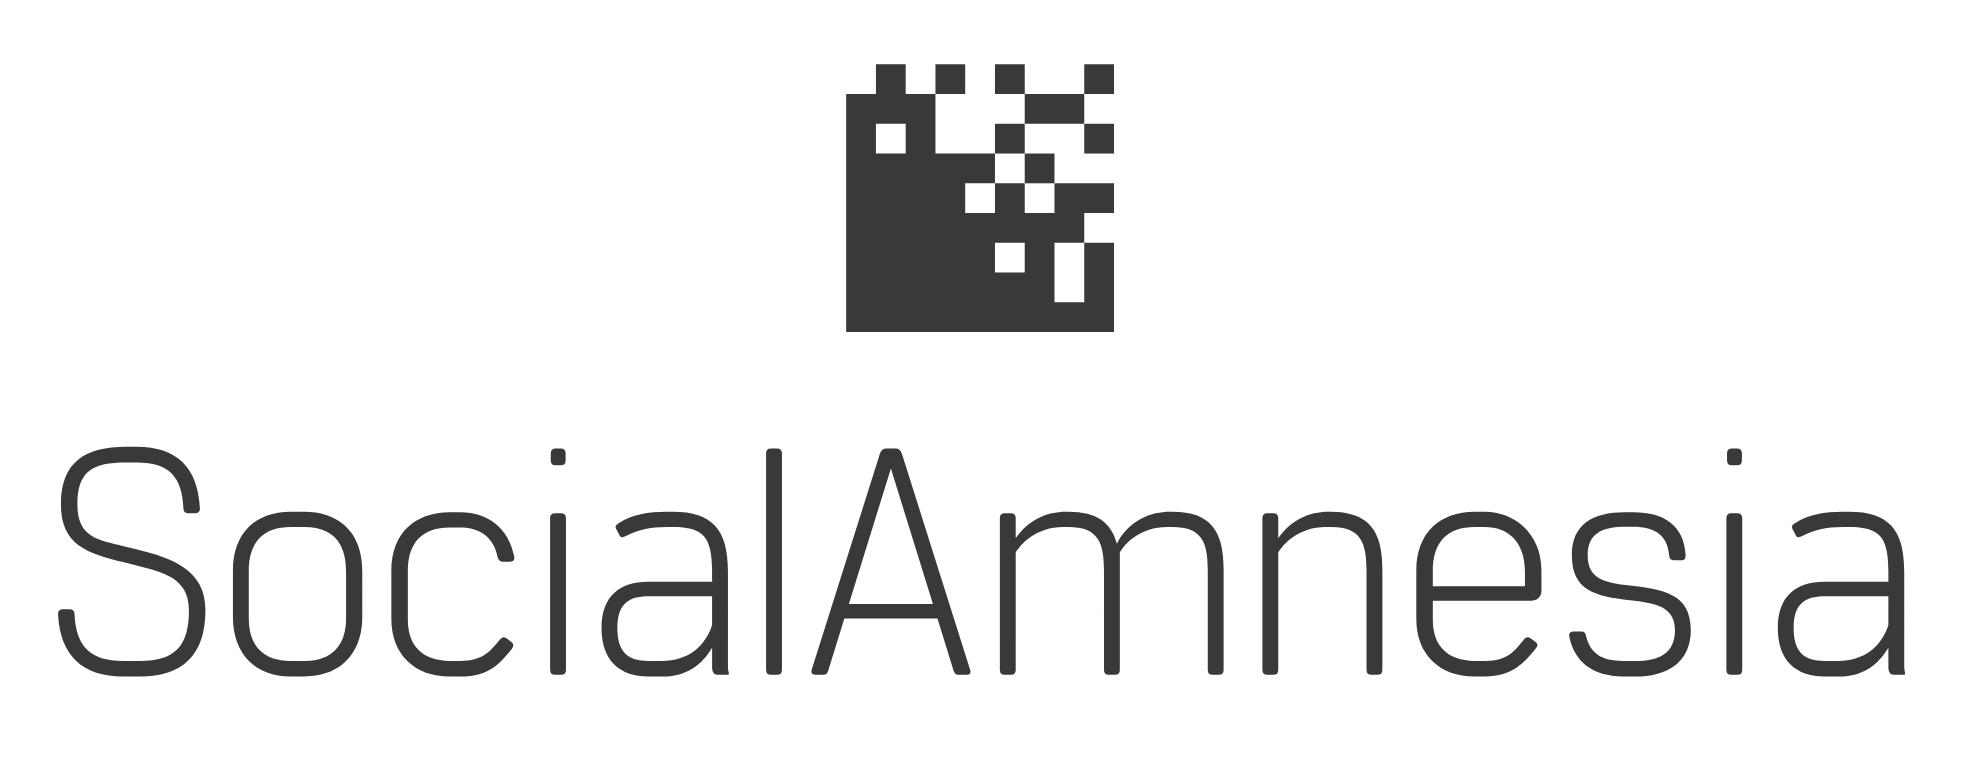 Social Amnesia Logo